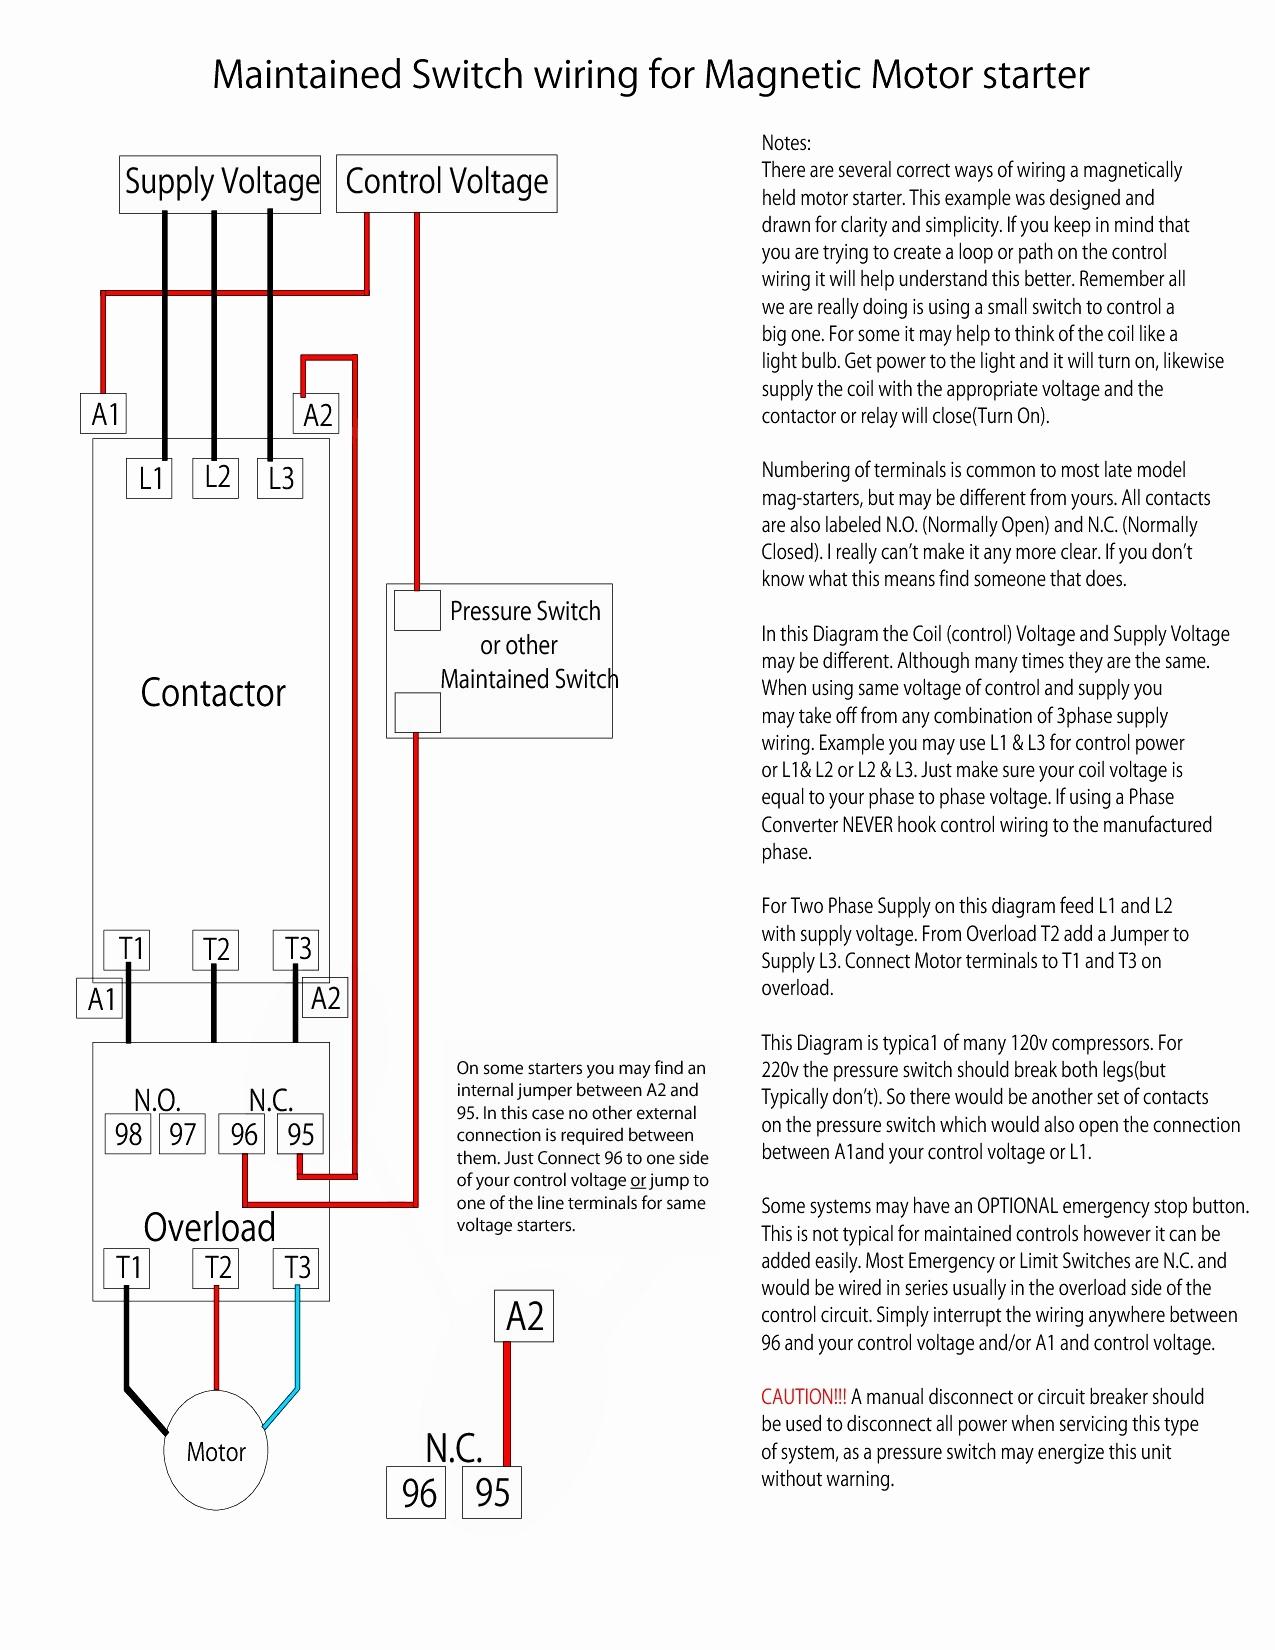 [XOTG_4463]  FS_5091] A1 A2 Contactor Wiring Diagram Download Diagram | A1 A2 Contactor Wiring Diagram |  | Hyedi Basi Apan Pneu Tzici Rect Mohammedshrine Librar Wiring 101